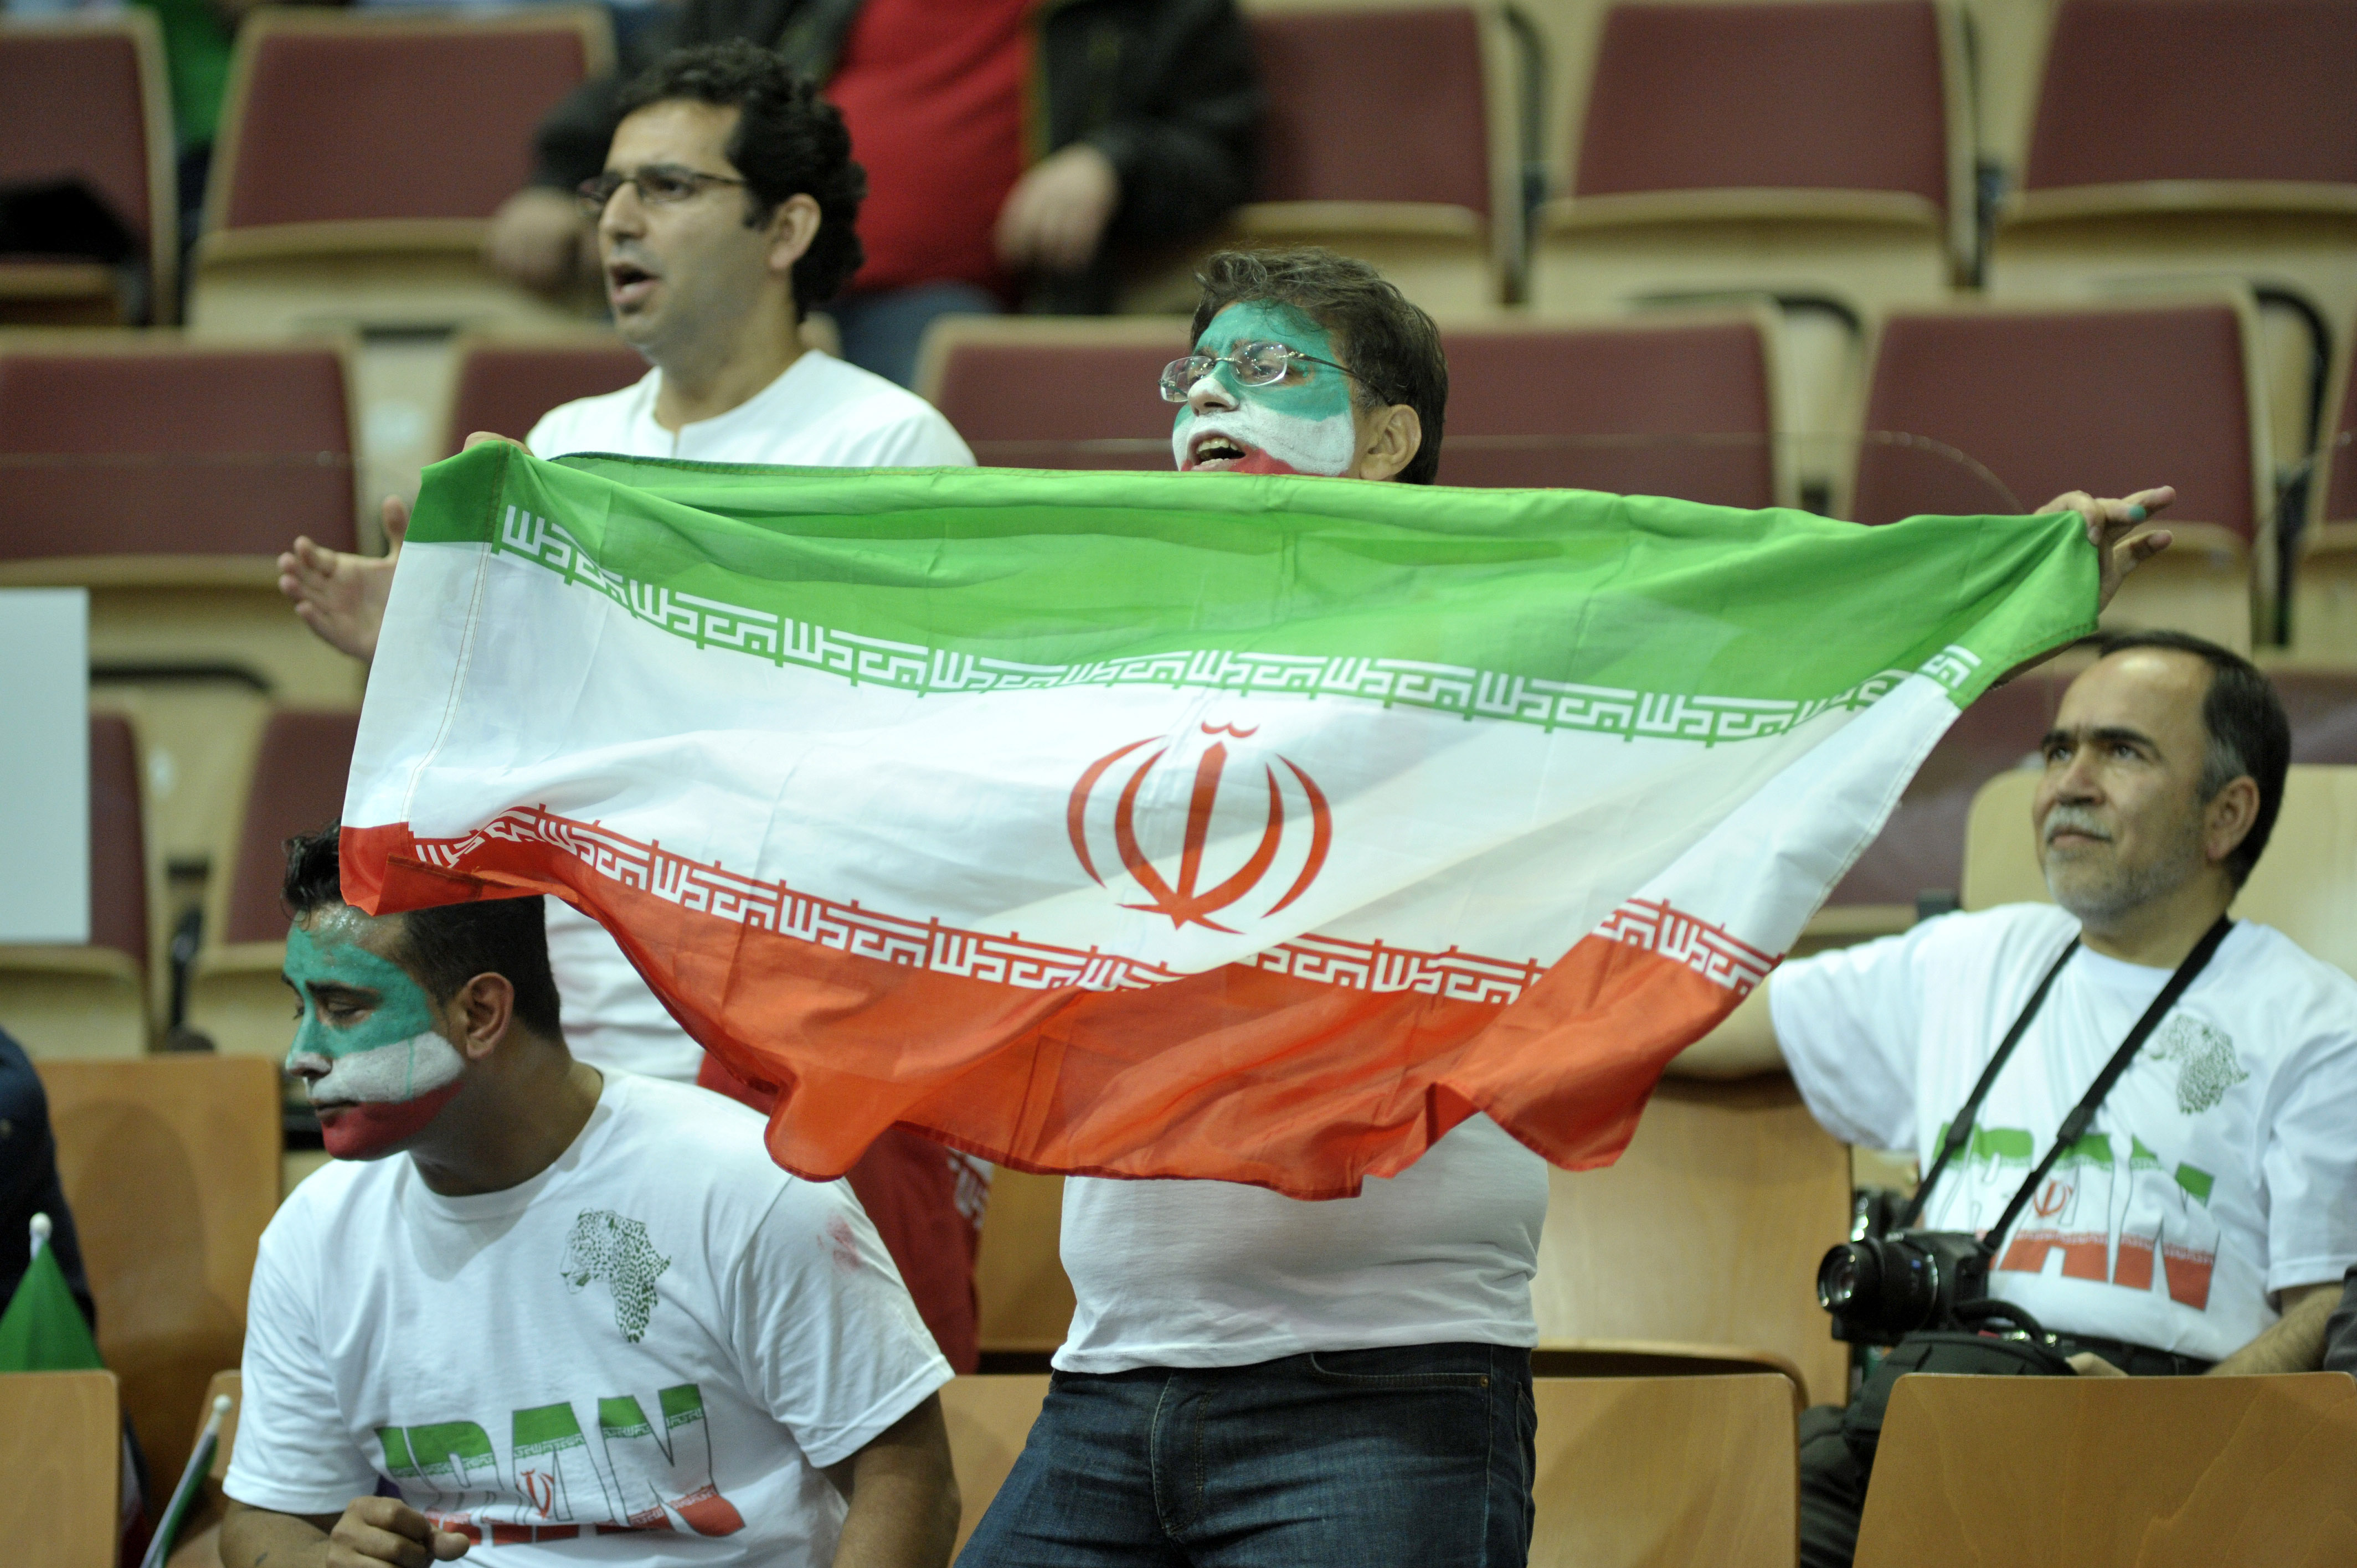 والیبال قهرمانی جهان عکس والیبال تماشاگران والیبال تماشاگران ایران